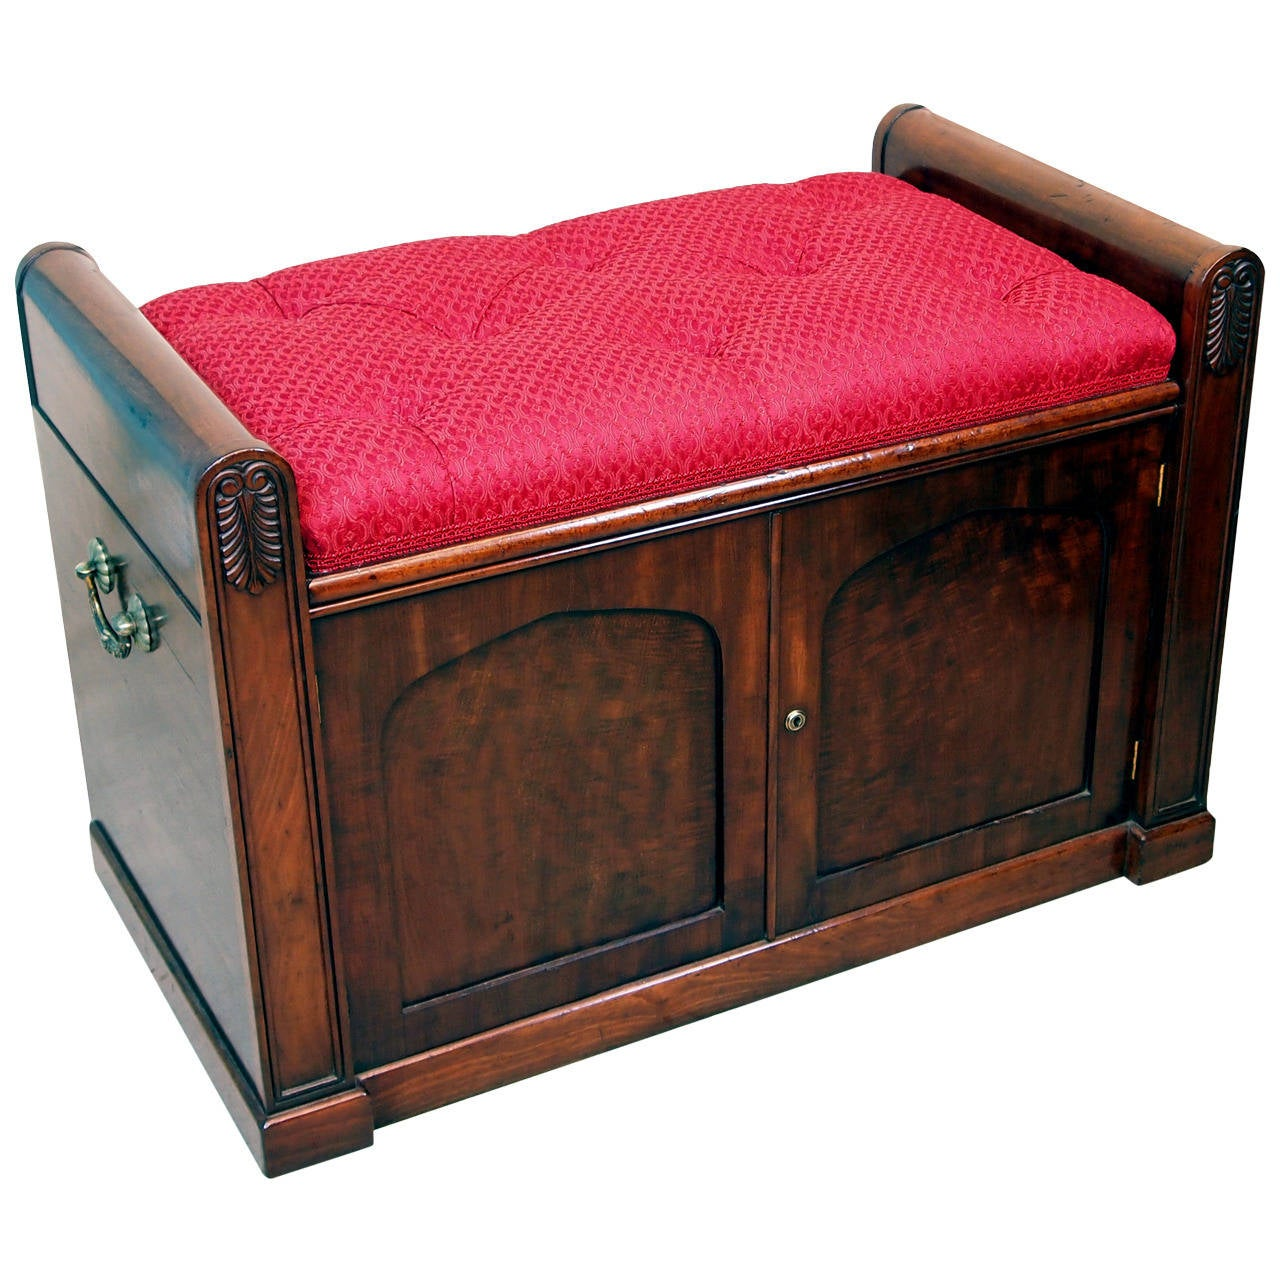 Antique Regency Mahogany Window Seat Bench At 1stdibs